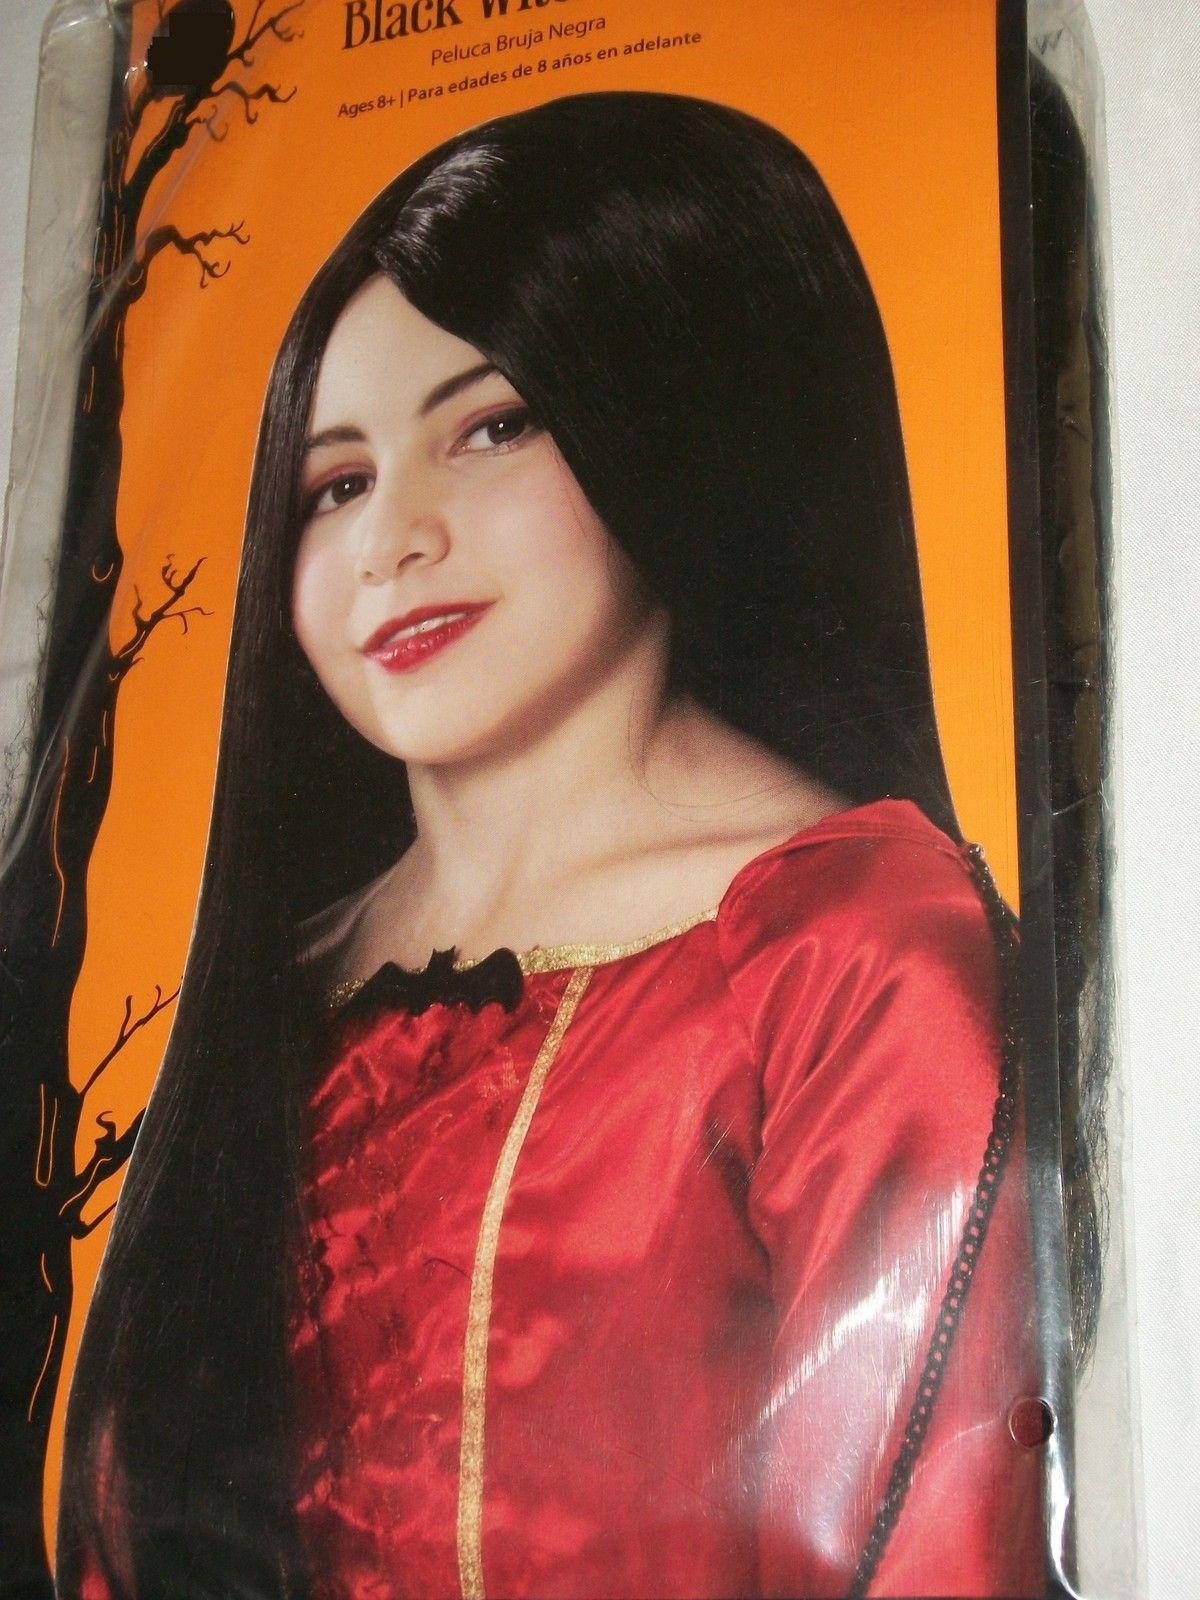 Halloween costume childus long black witch vampire snow white wig